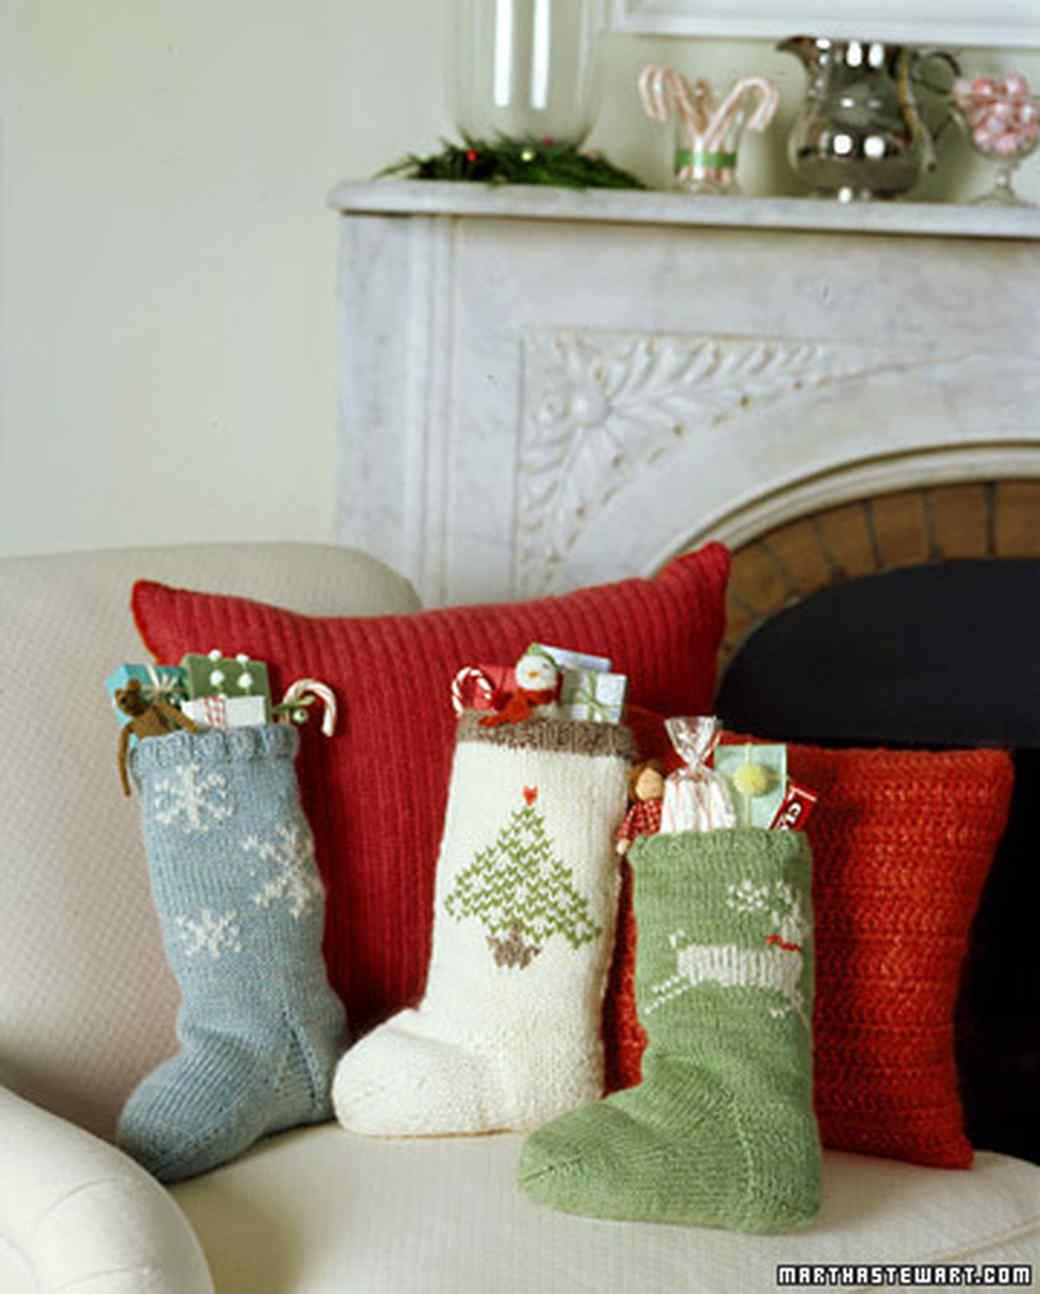 Sock Pattern for Knit Christmas Stockings | Martha Stewart